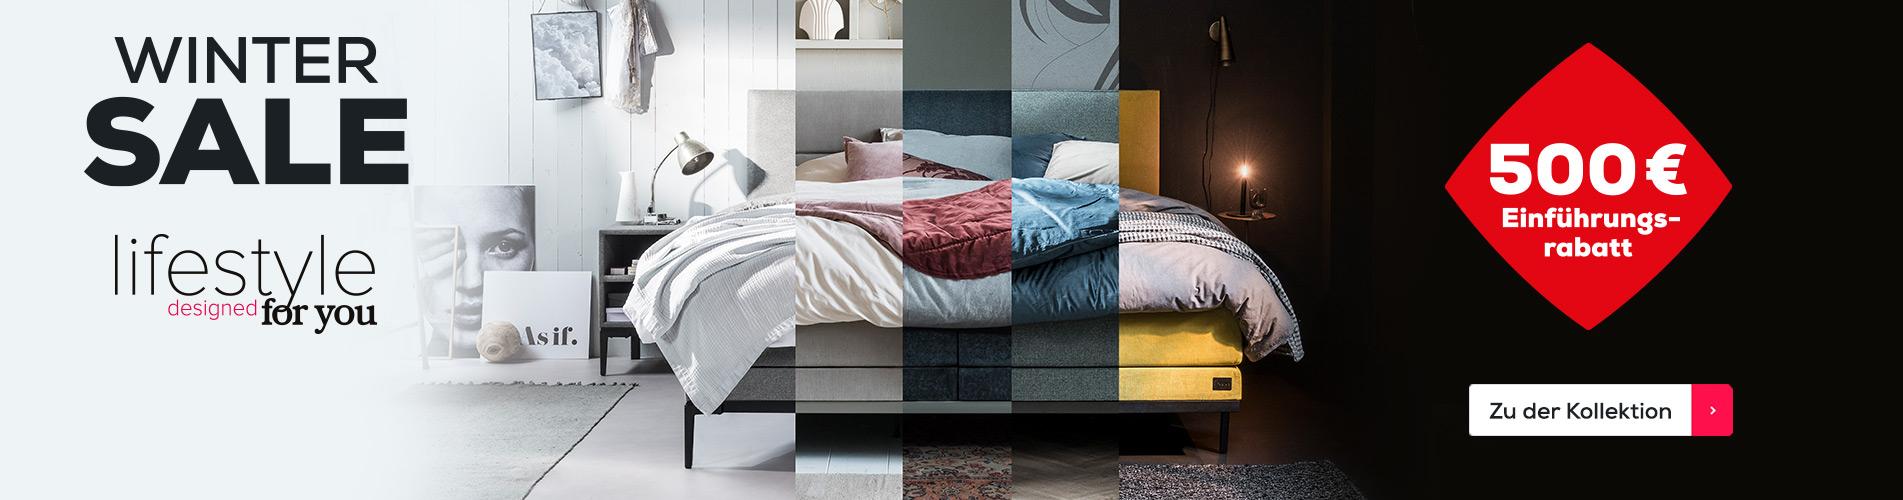 Lifestyle designed for you Kollektion | Swiss Sense